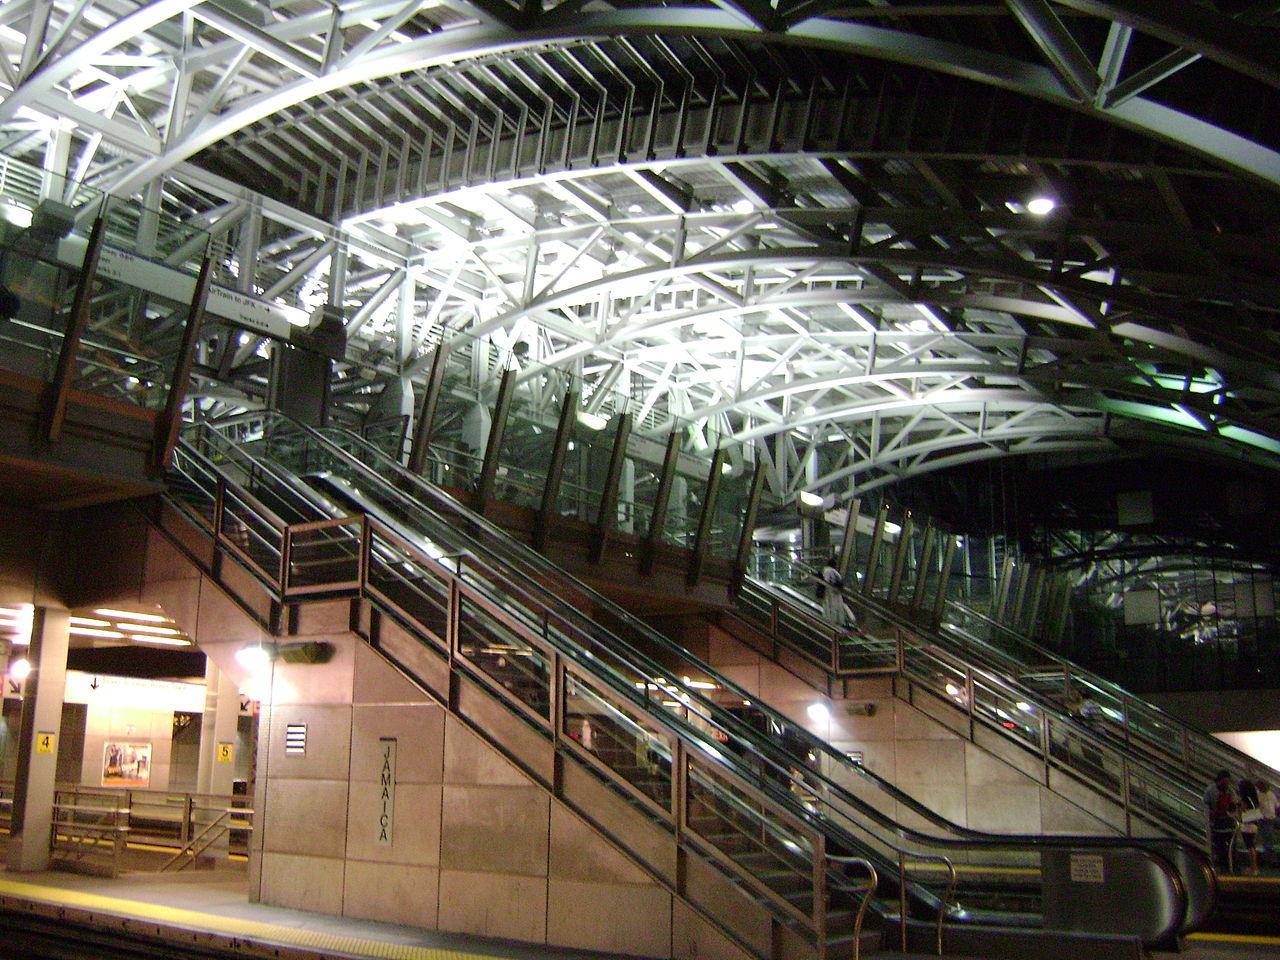 1280px-Jamaica_Station_Arch